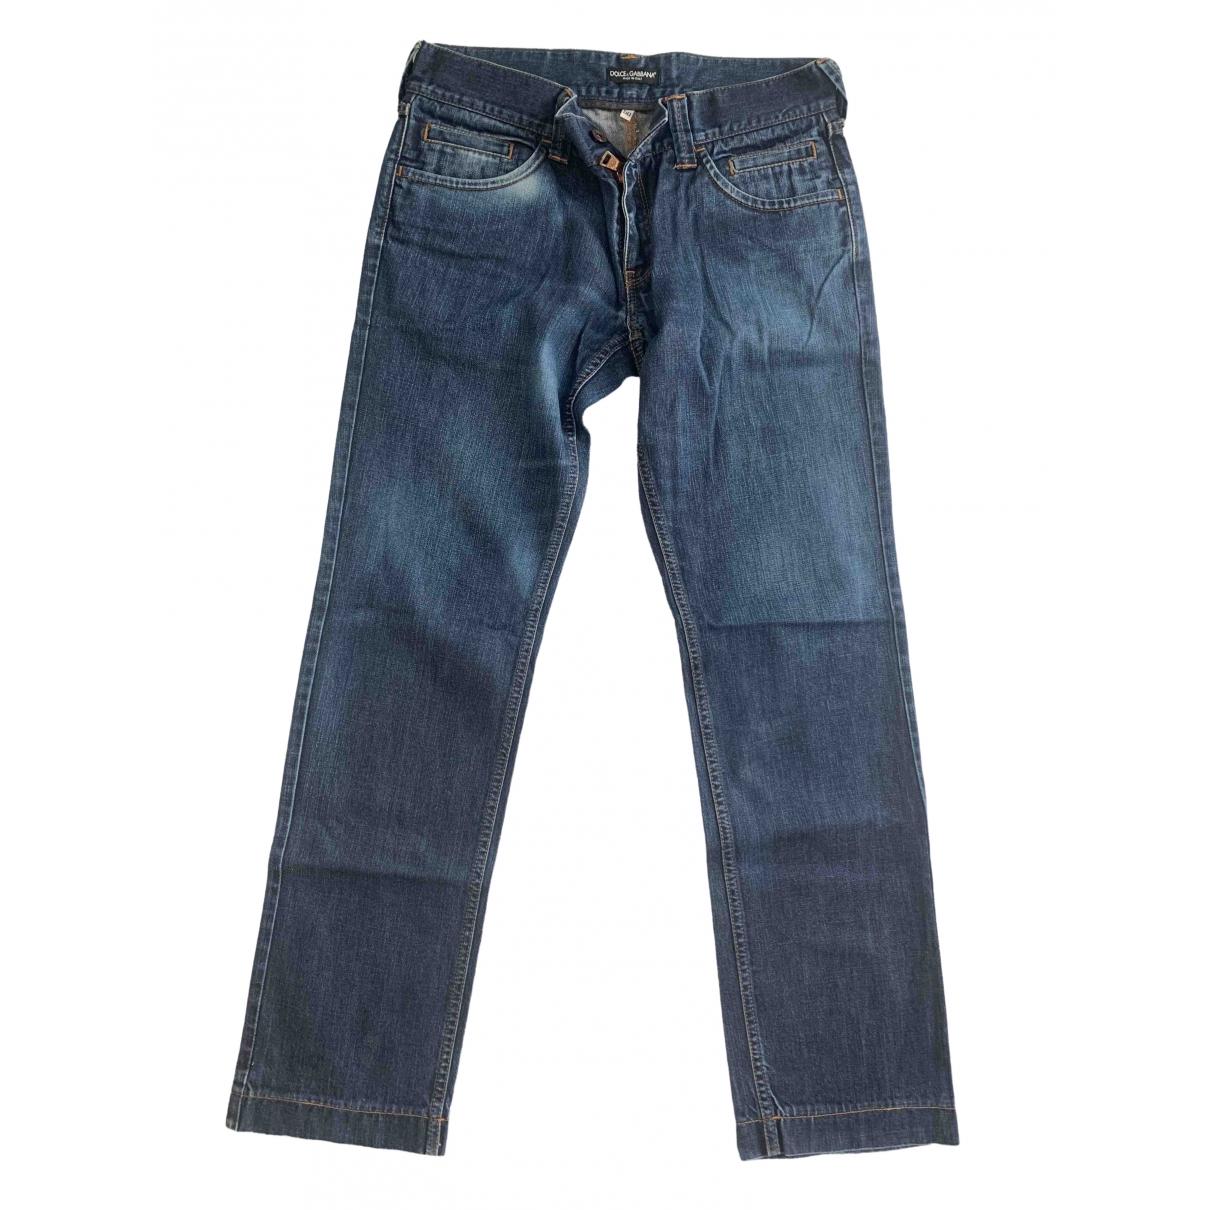 Dolce & Gabbana \N Blue Cotton Jeans for Men 33 US